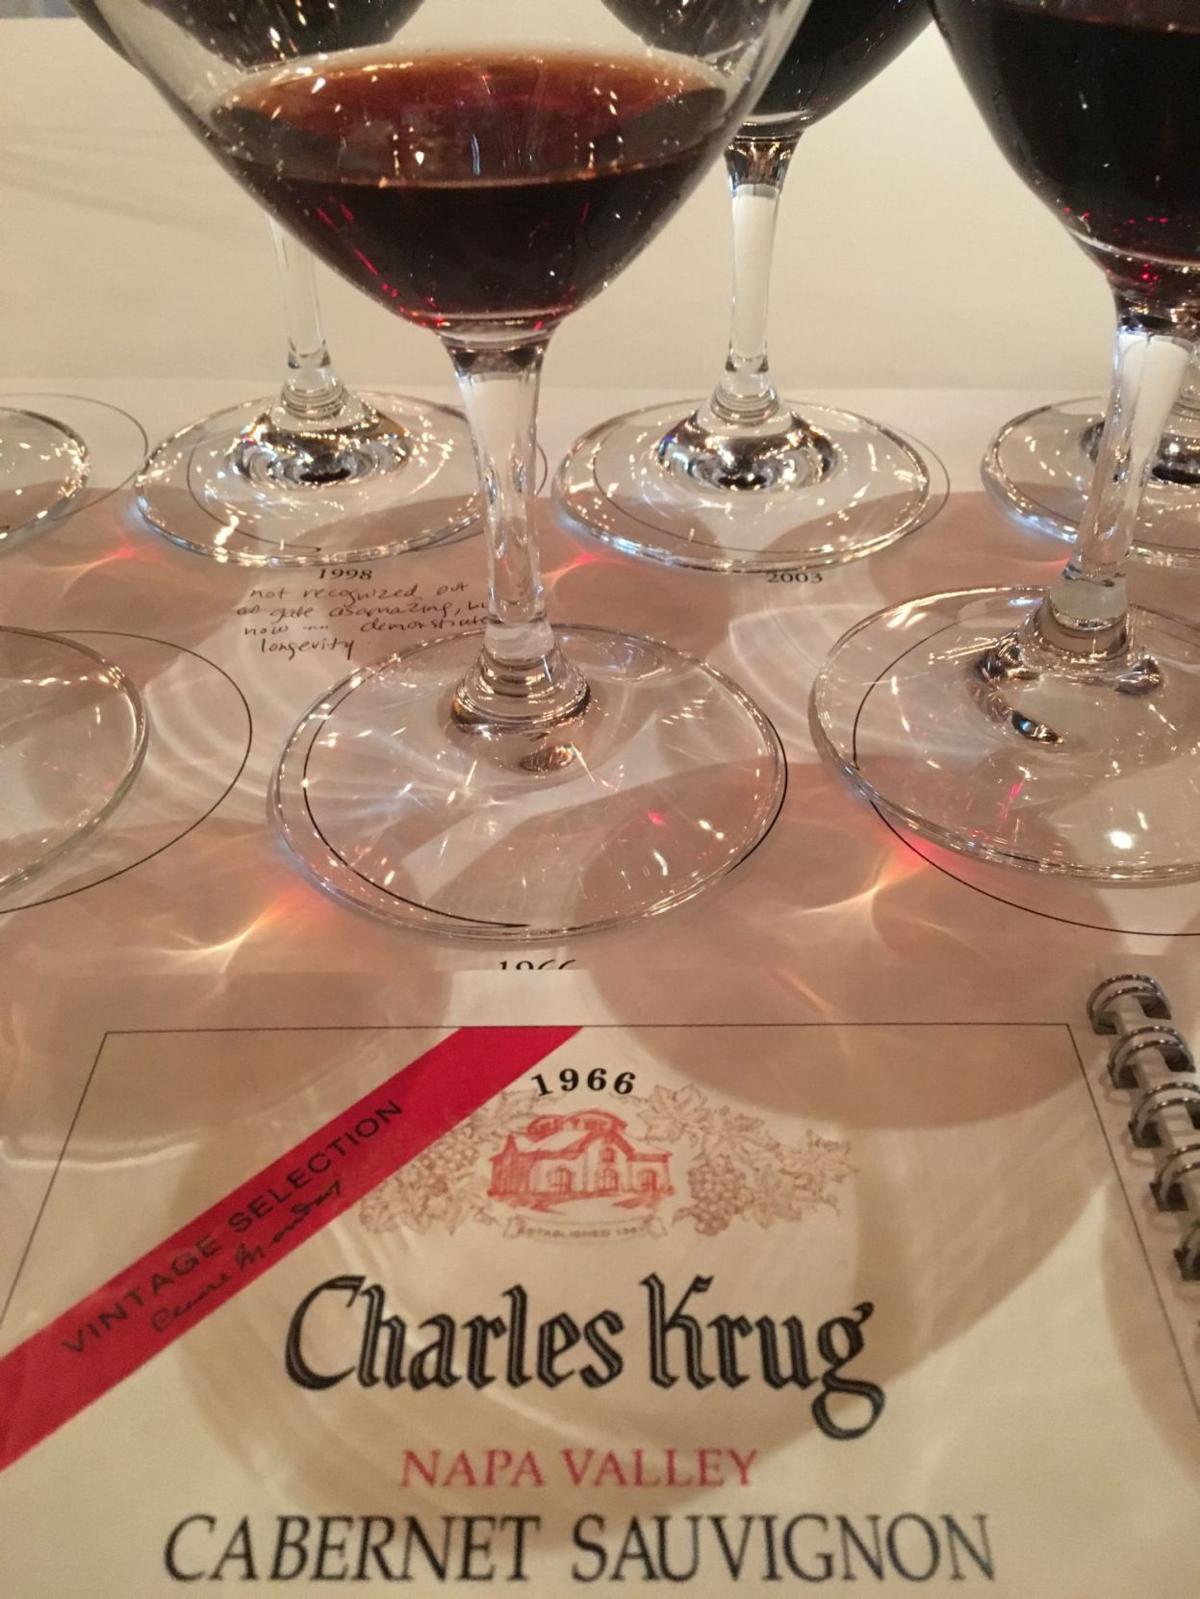 Charles Krug Vintage Selection Cabernet Sauvignon